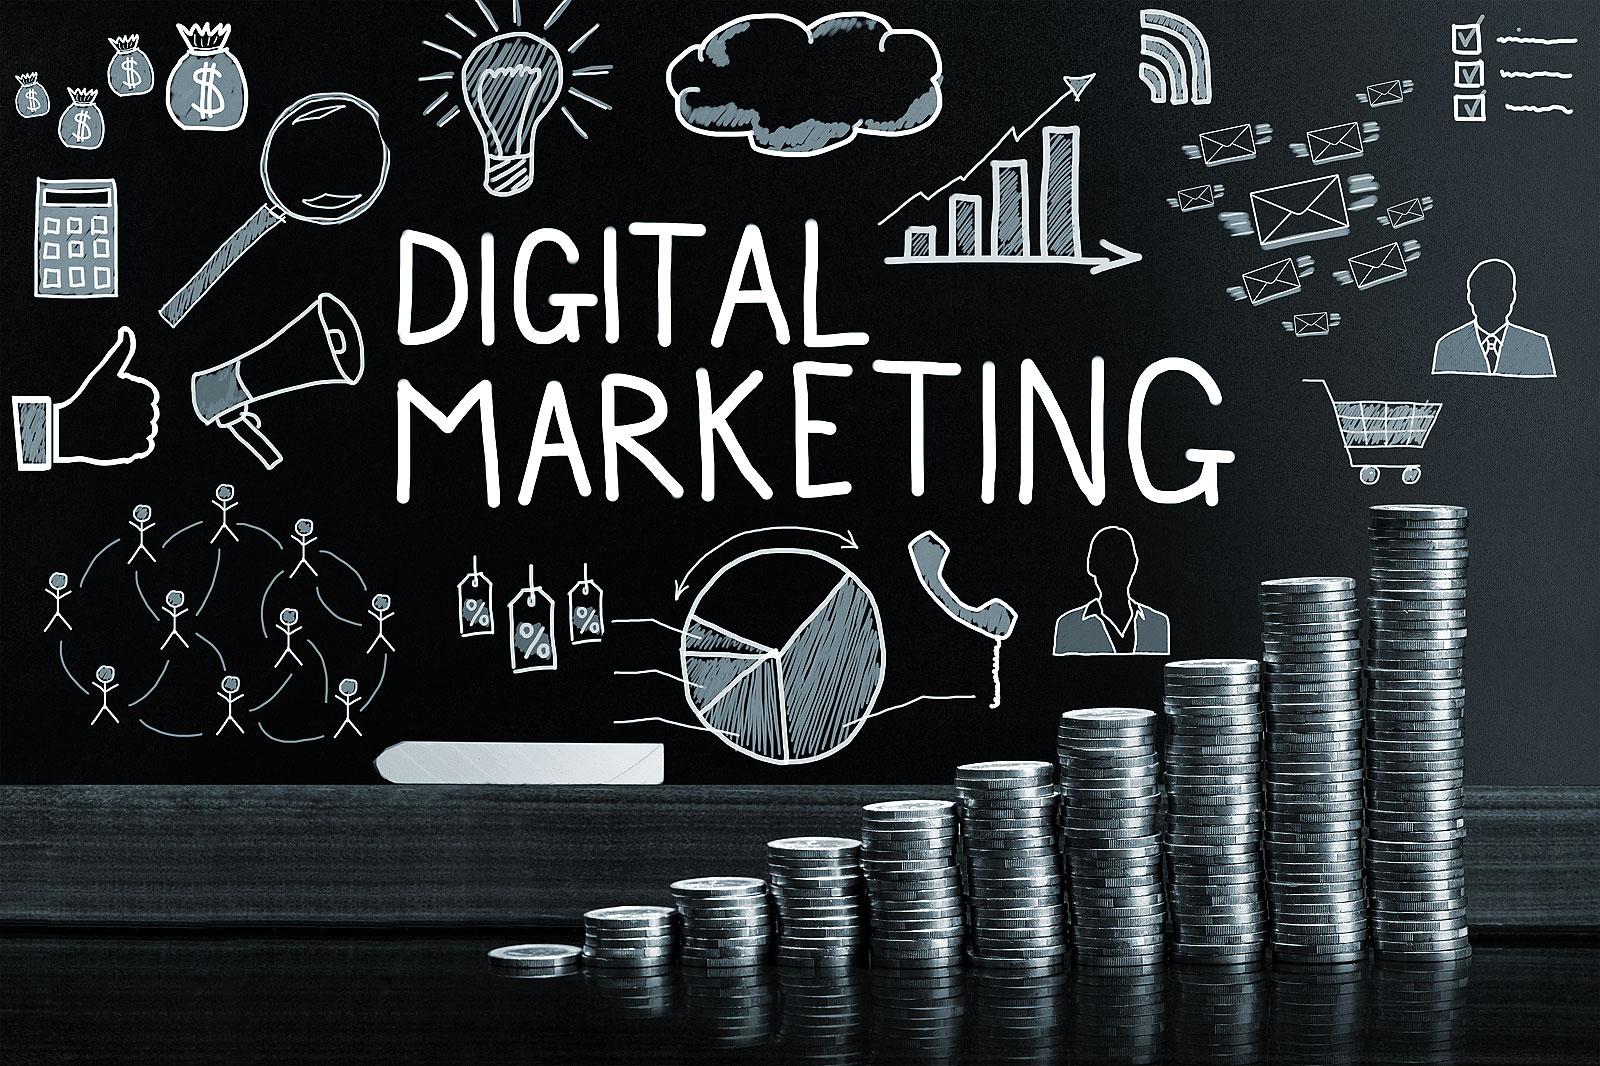 Top 1 Marketing Agency, Social Media Advertising Agency đáng tham khảo